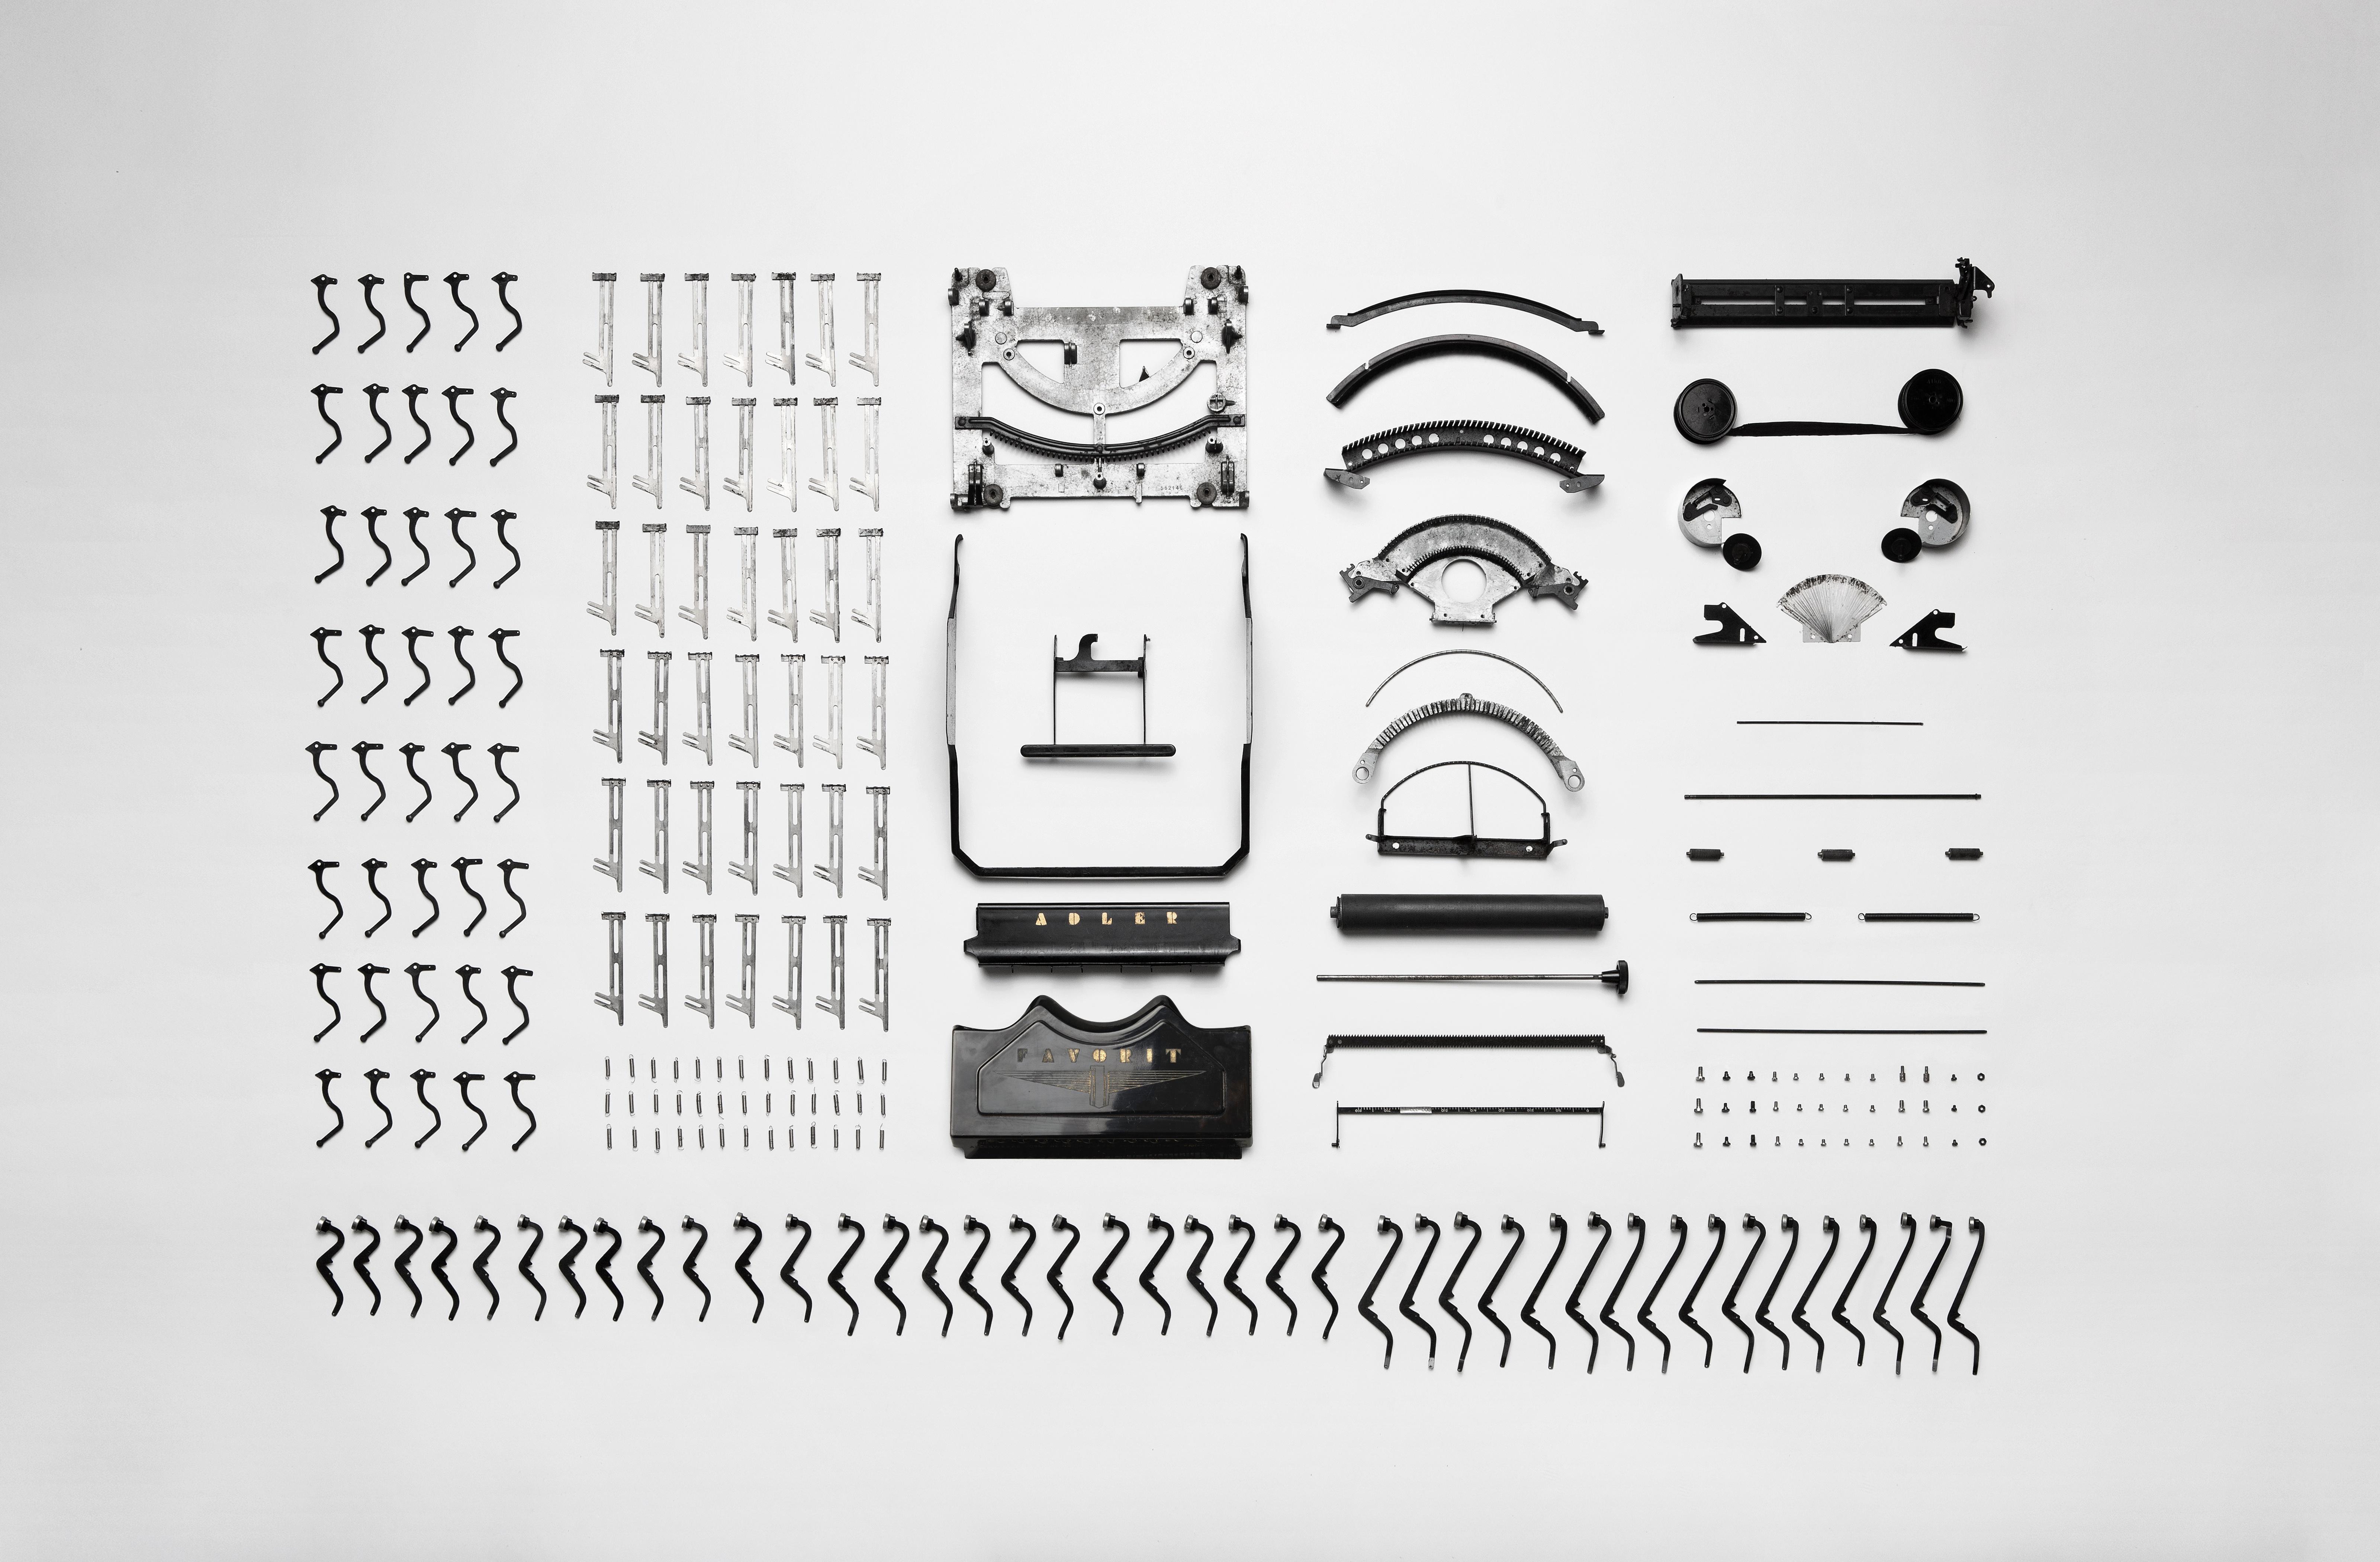 03-parts.jpg